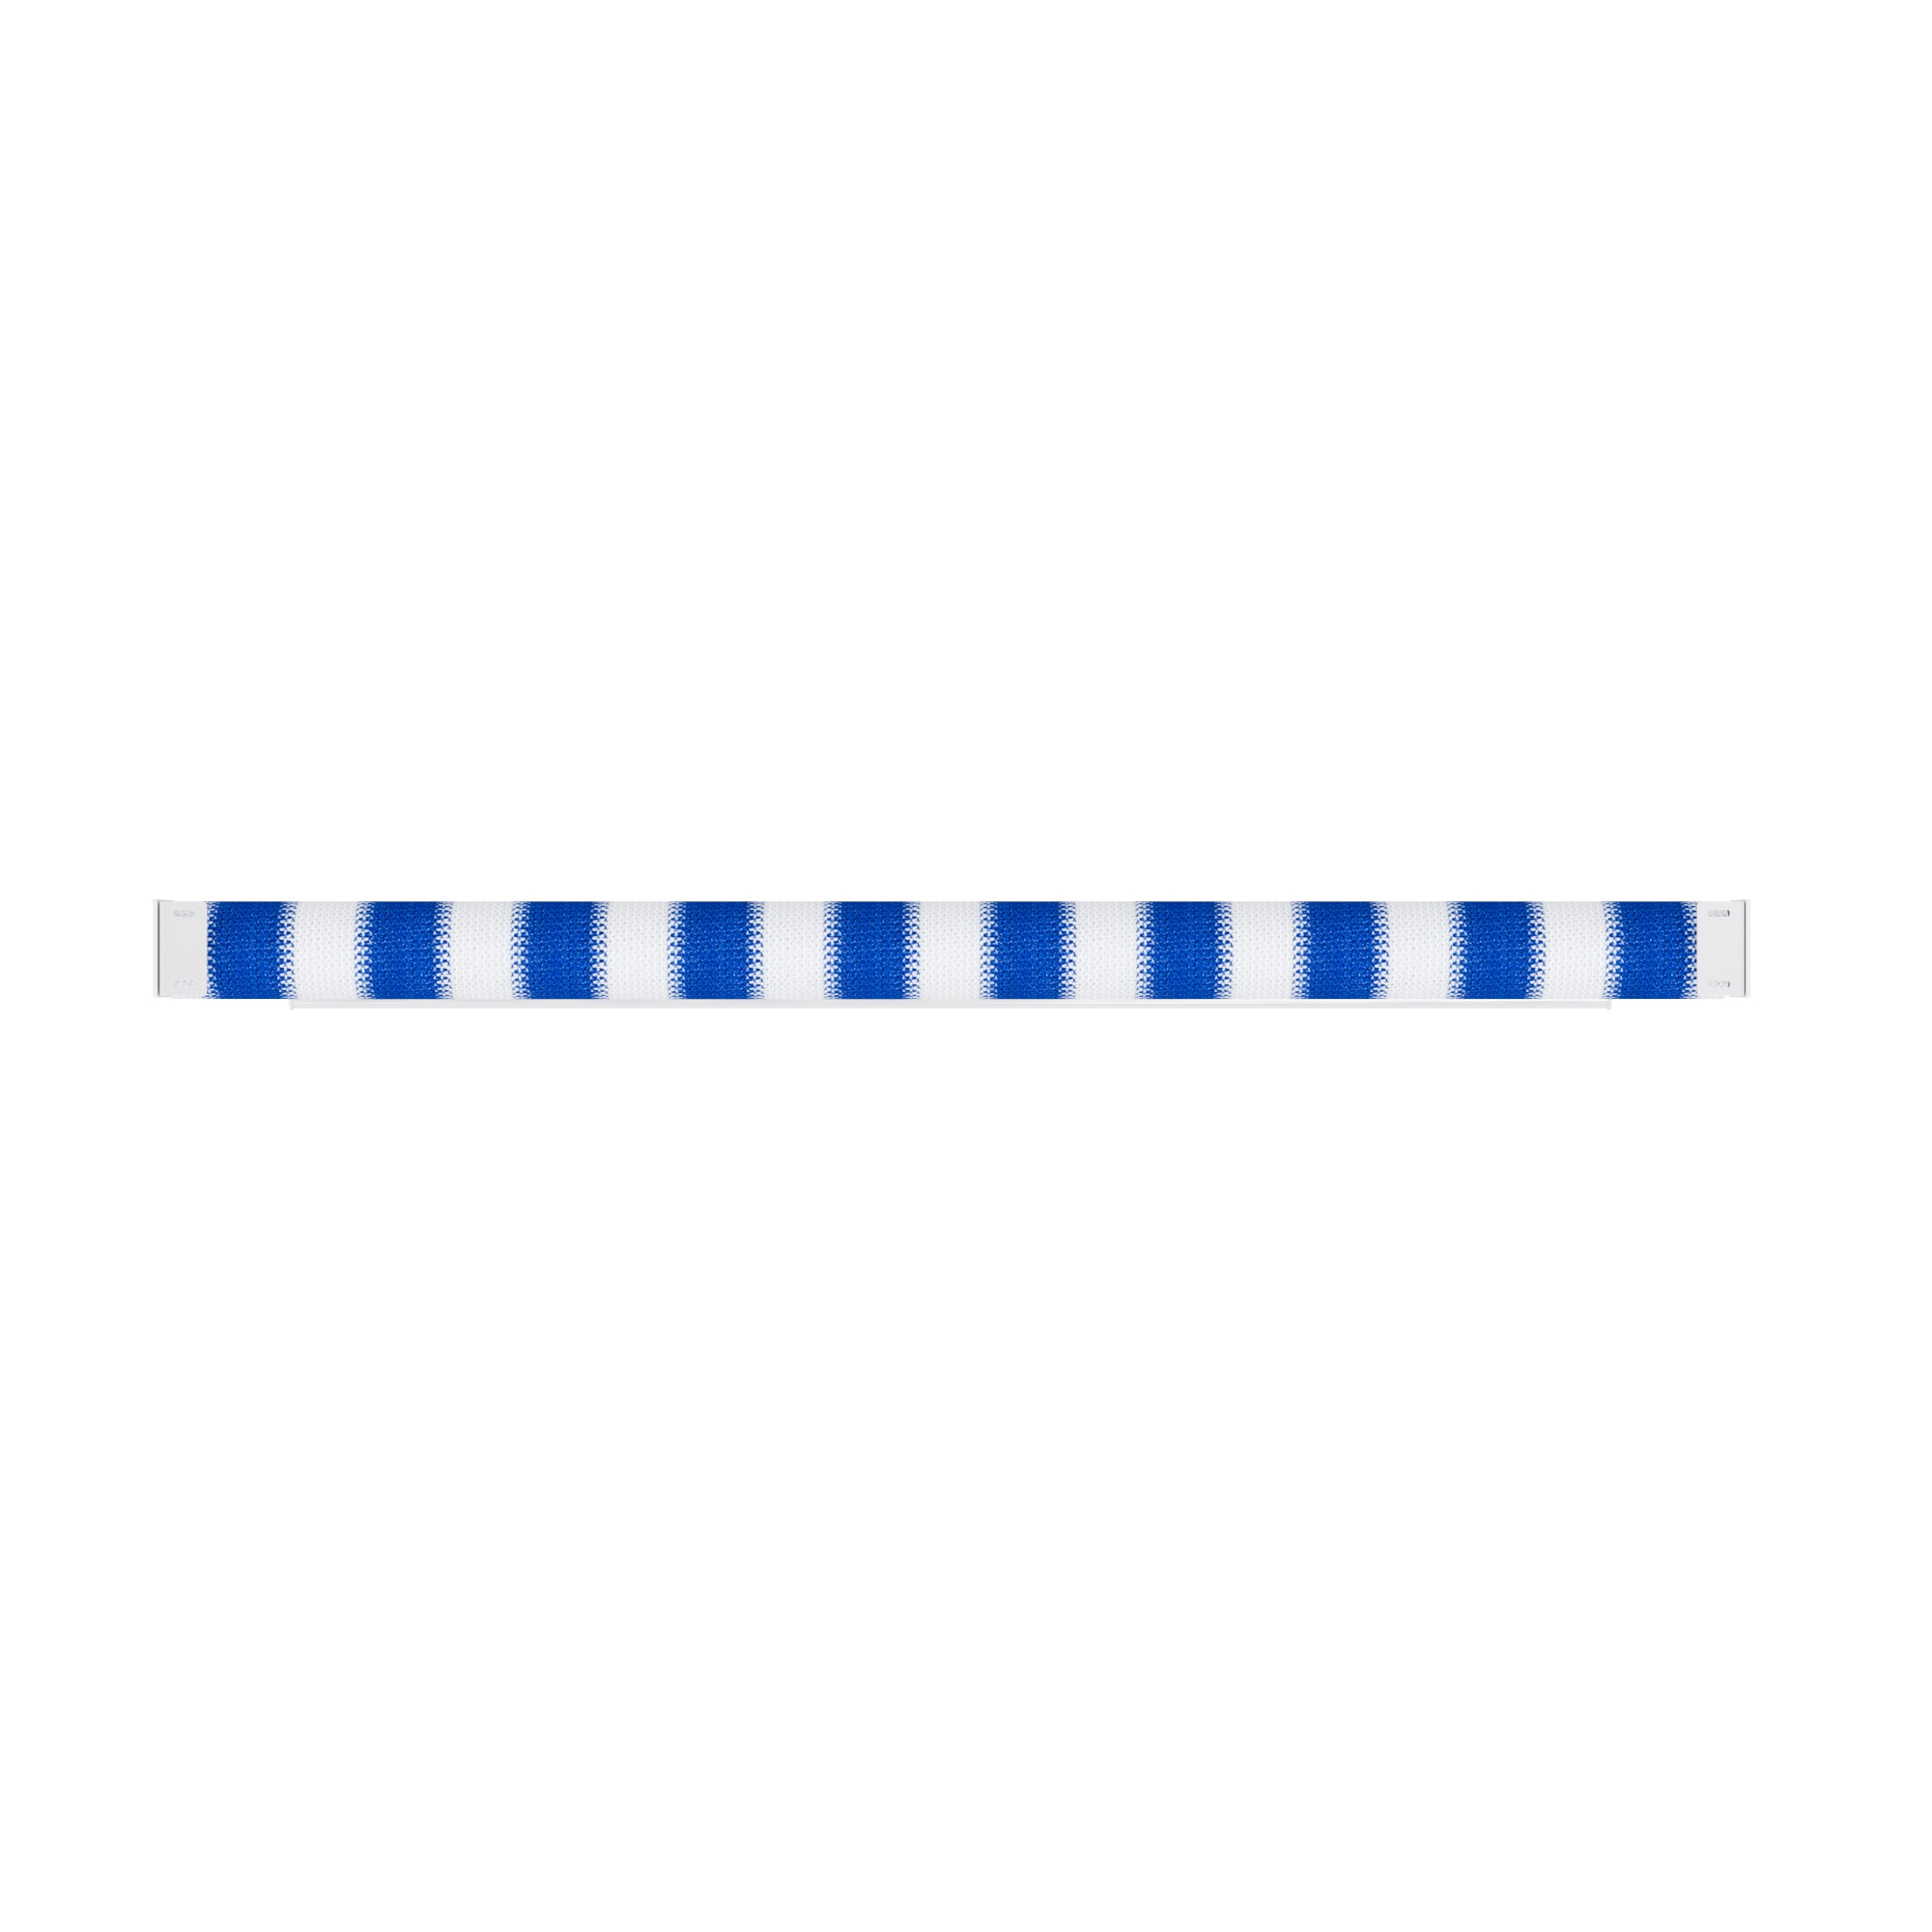 JAROLIFT-Senkrechtmarkise-Sichtschutz-Aussenrollo-Sonnenschutz-Aussen-Rollo-Balkon Indexbild 20